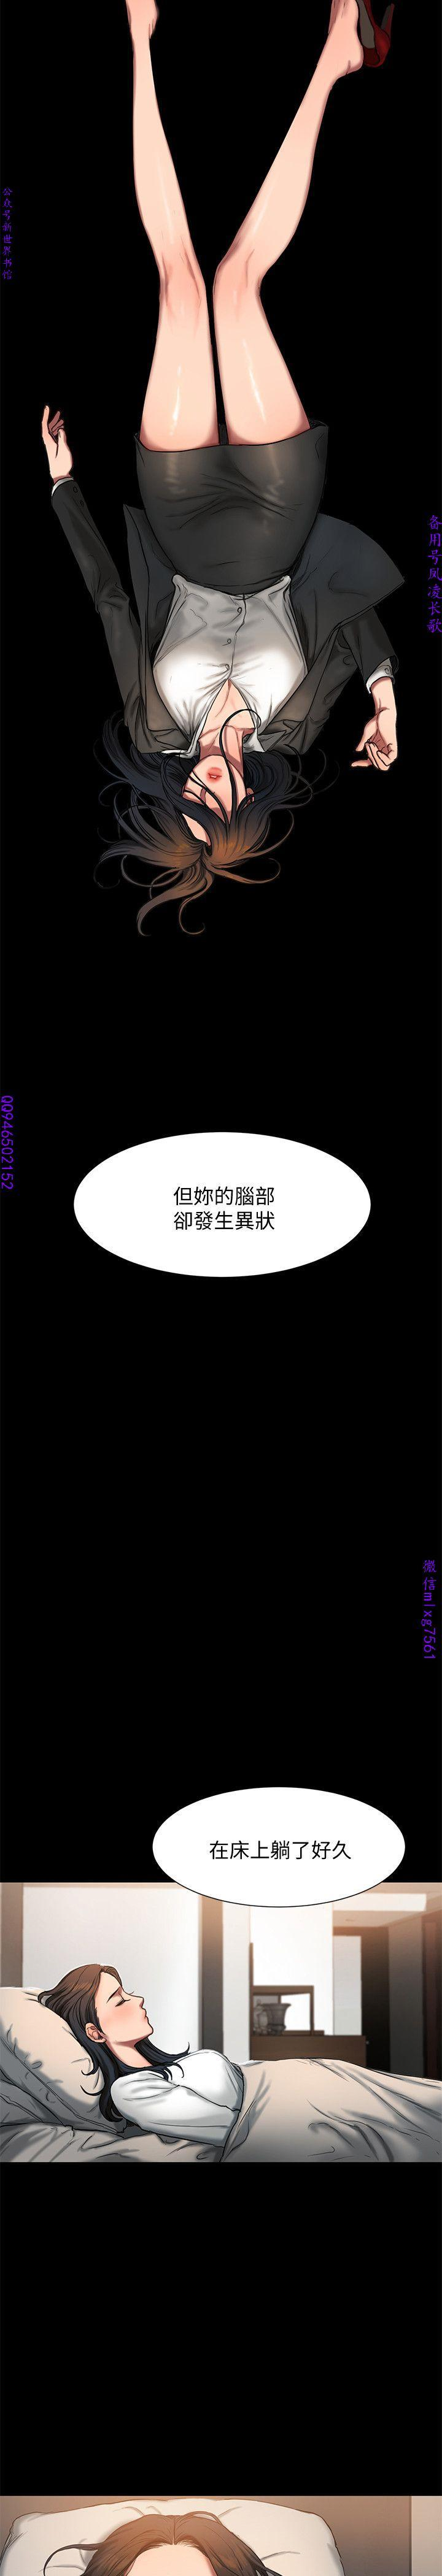 Run away 1-10【中文】 83